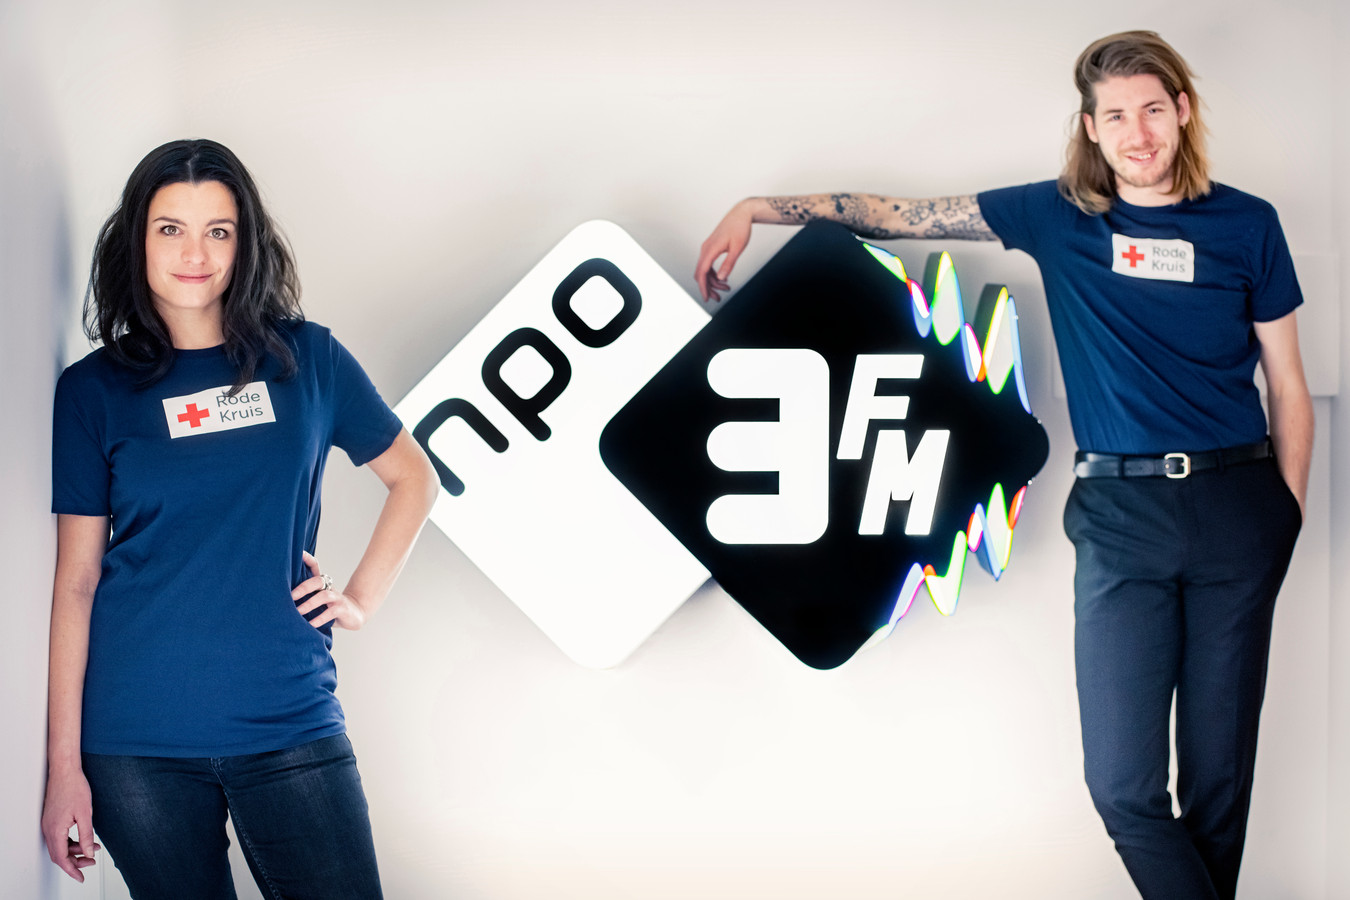 3FM-dj's Eva Koreman en Frank van der Lende.